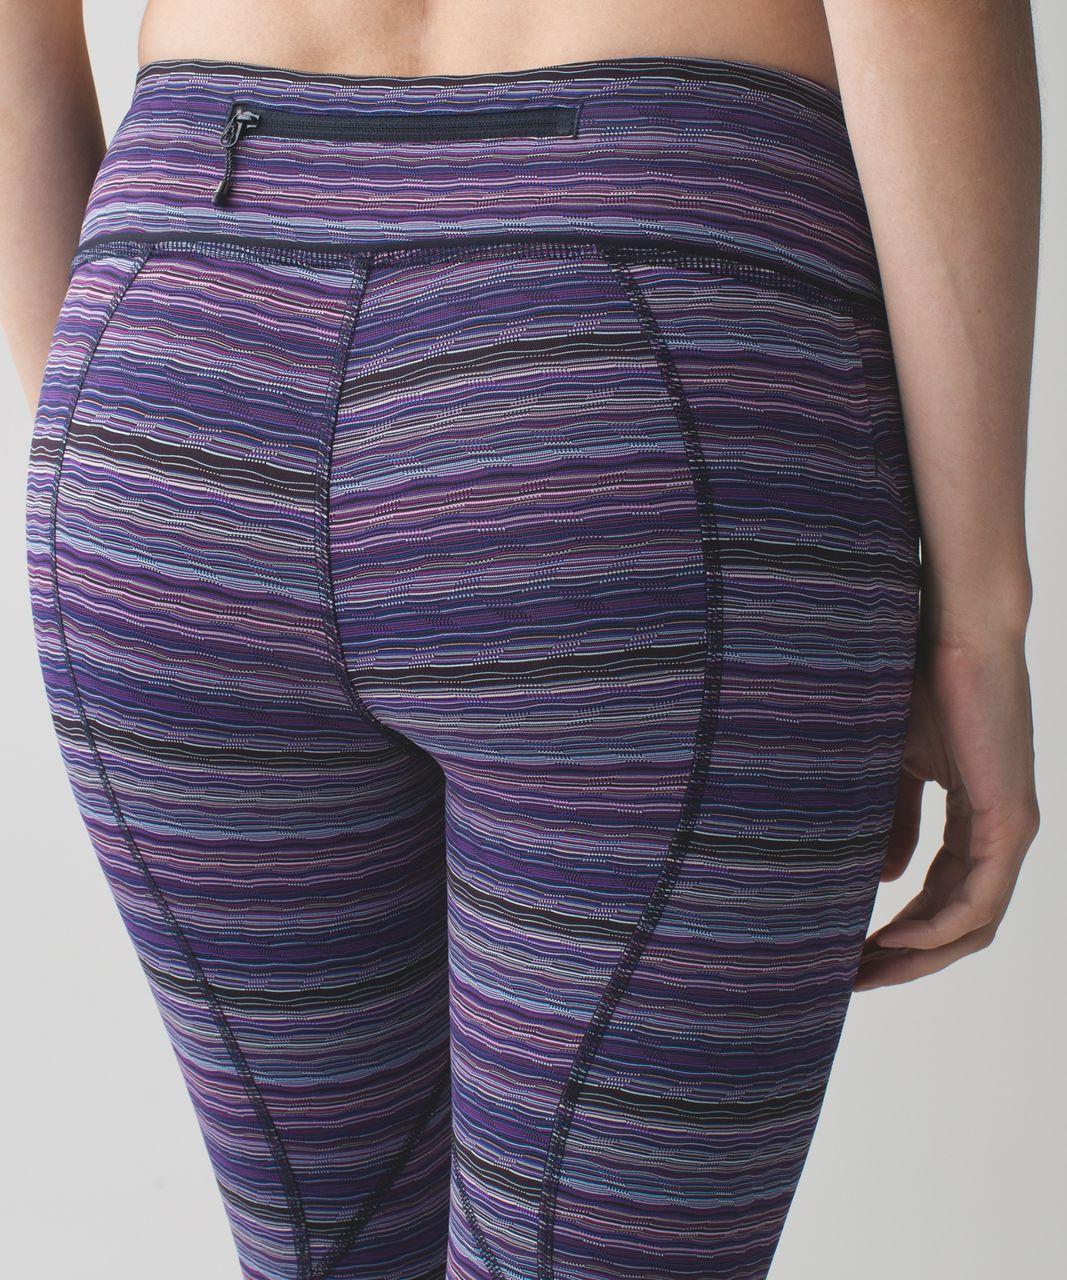 Lululemon Pace Rival Crop - Space Dye Twist Ultra Violet Multi / Naval Blue